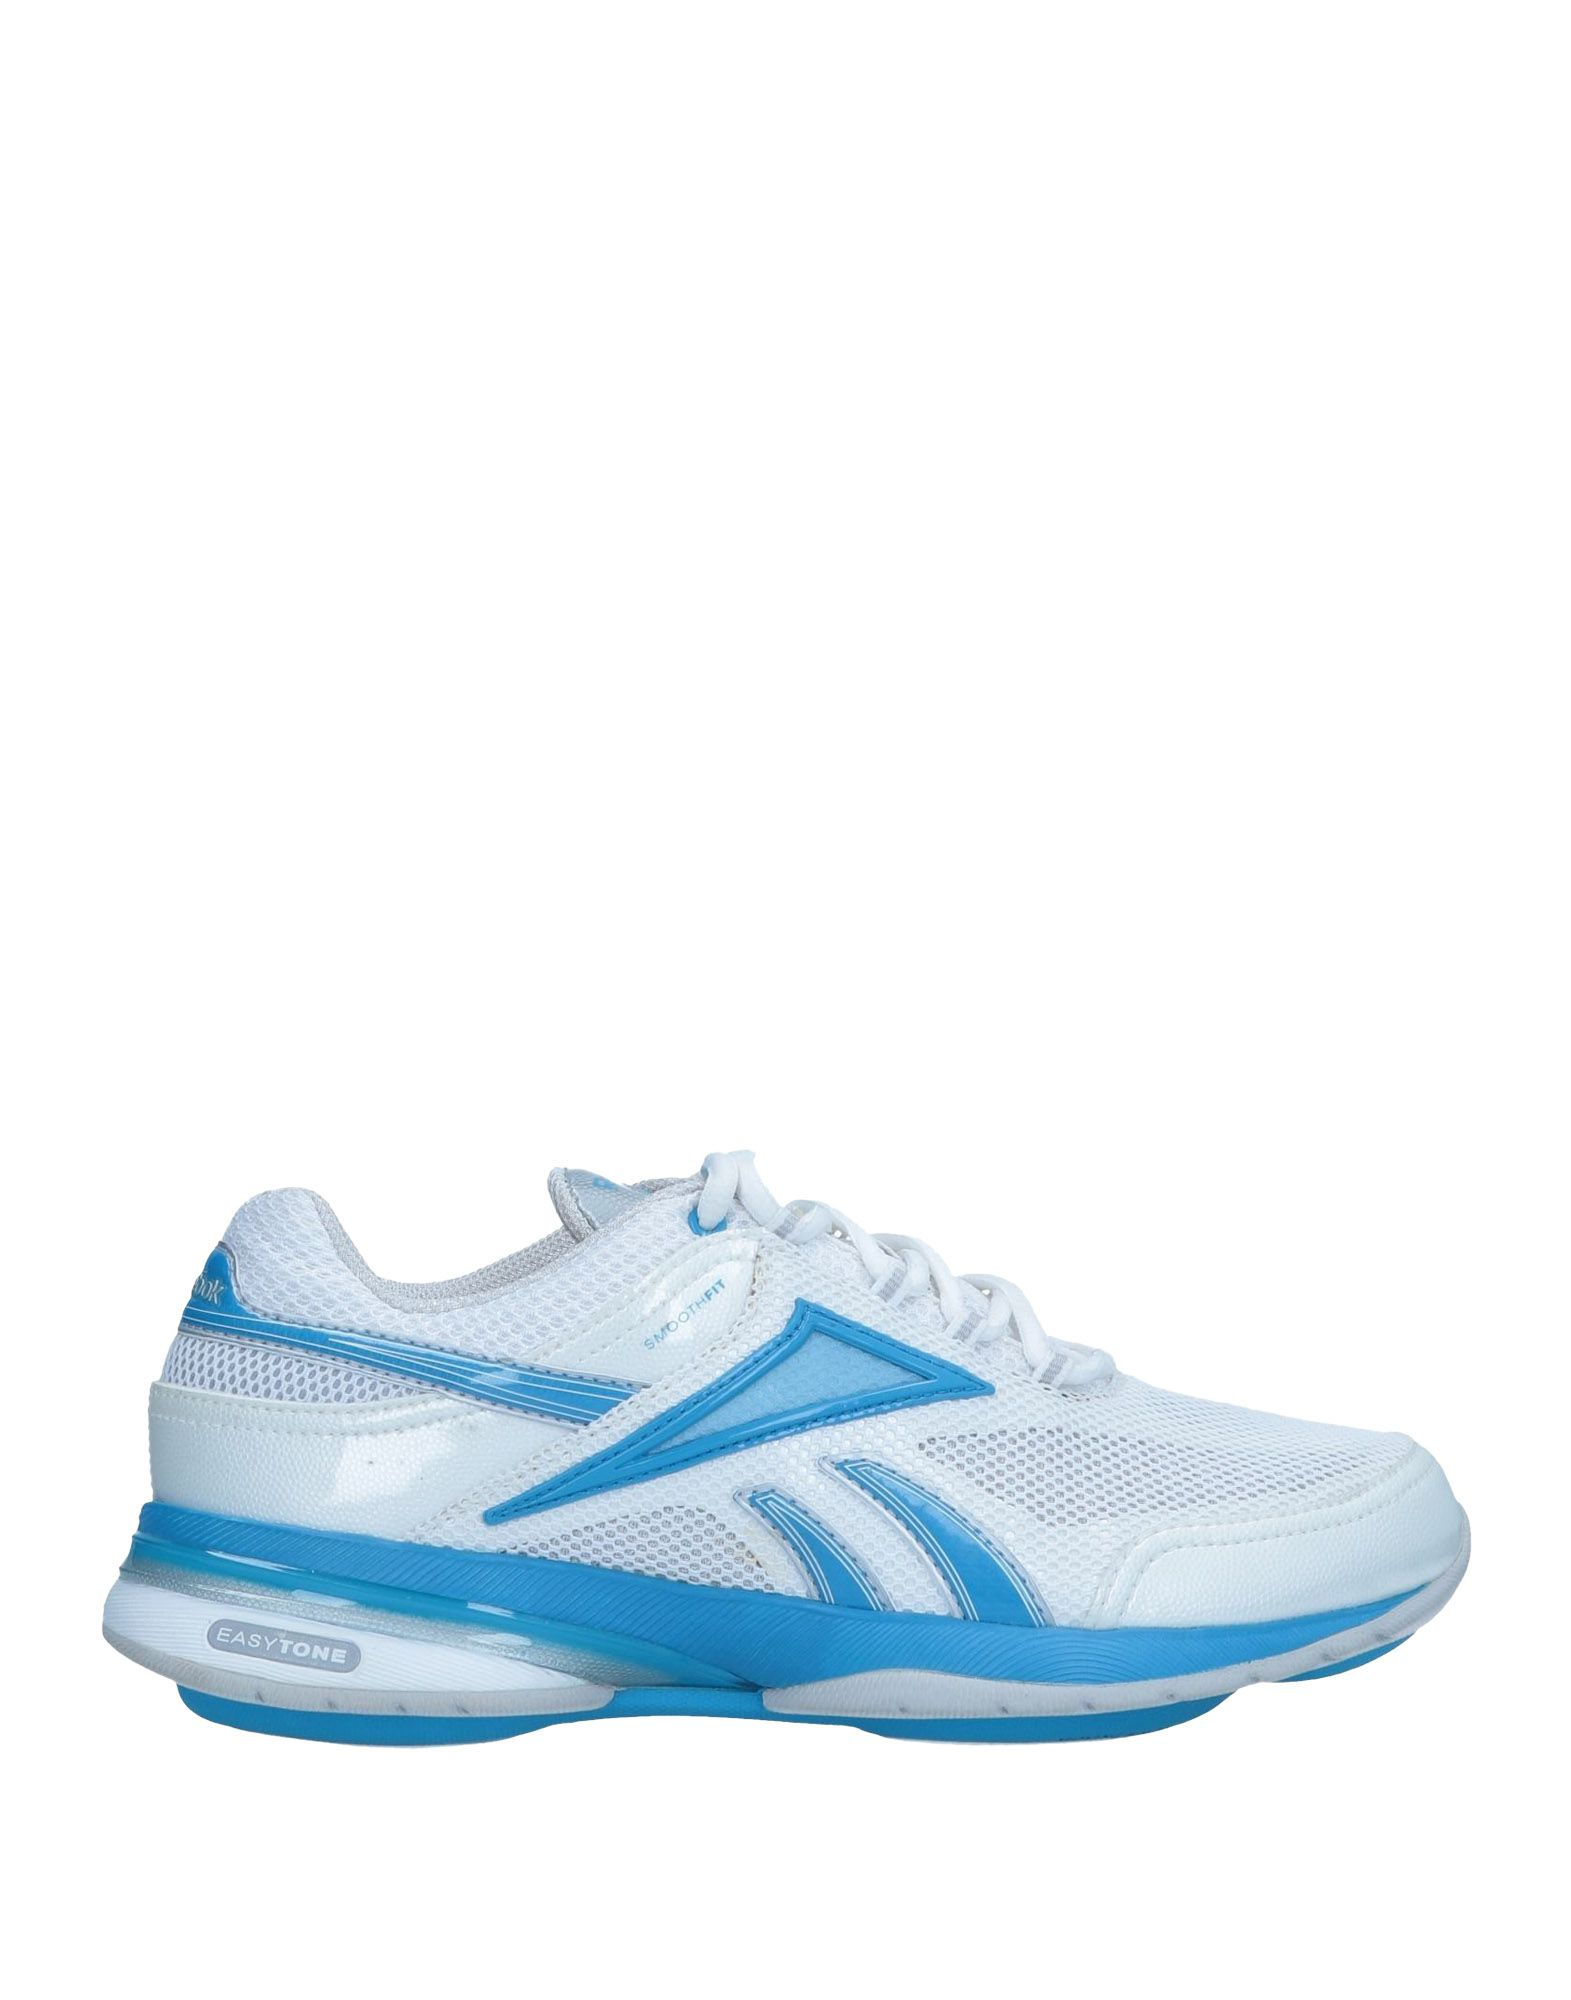 11546157JD Reebok Sneakers Damen  11546157JD  5c20ca